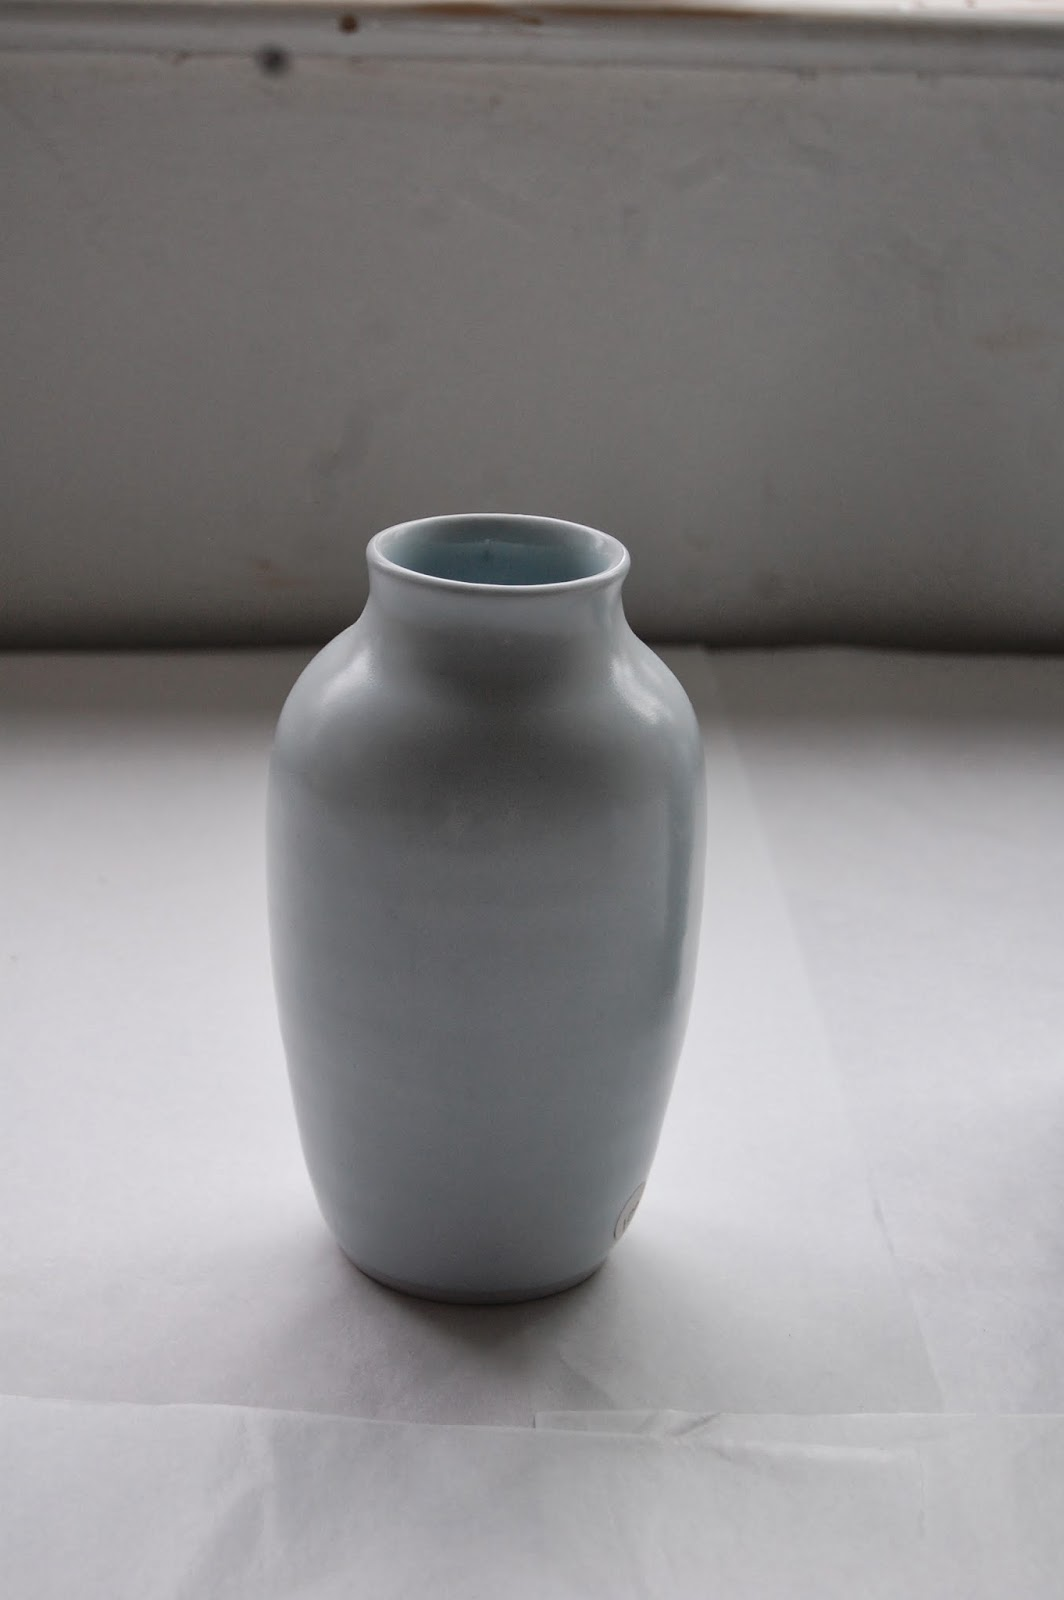 Michel Francois handmade Porcelain vase